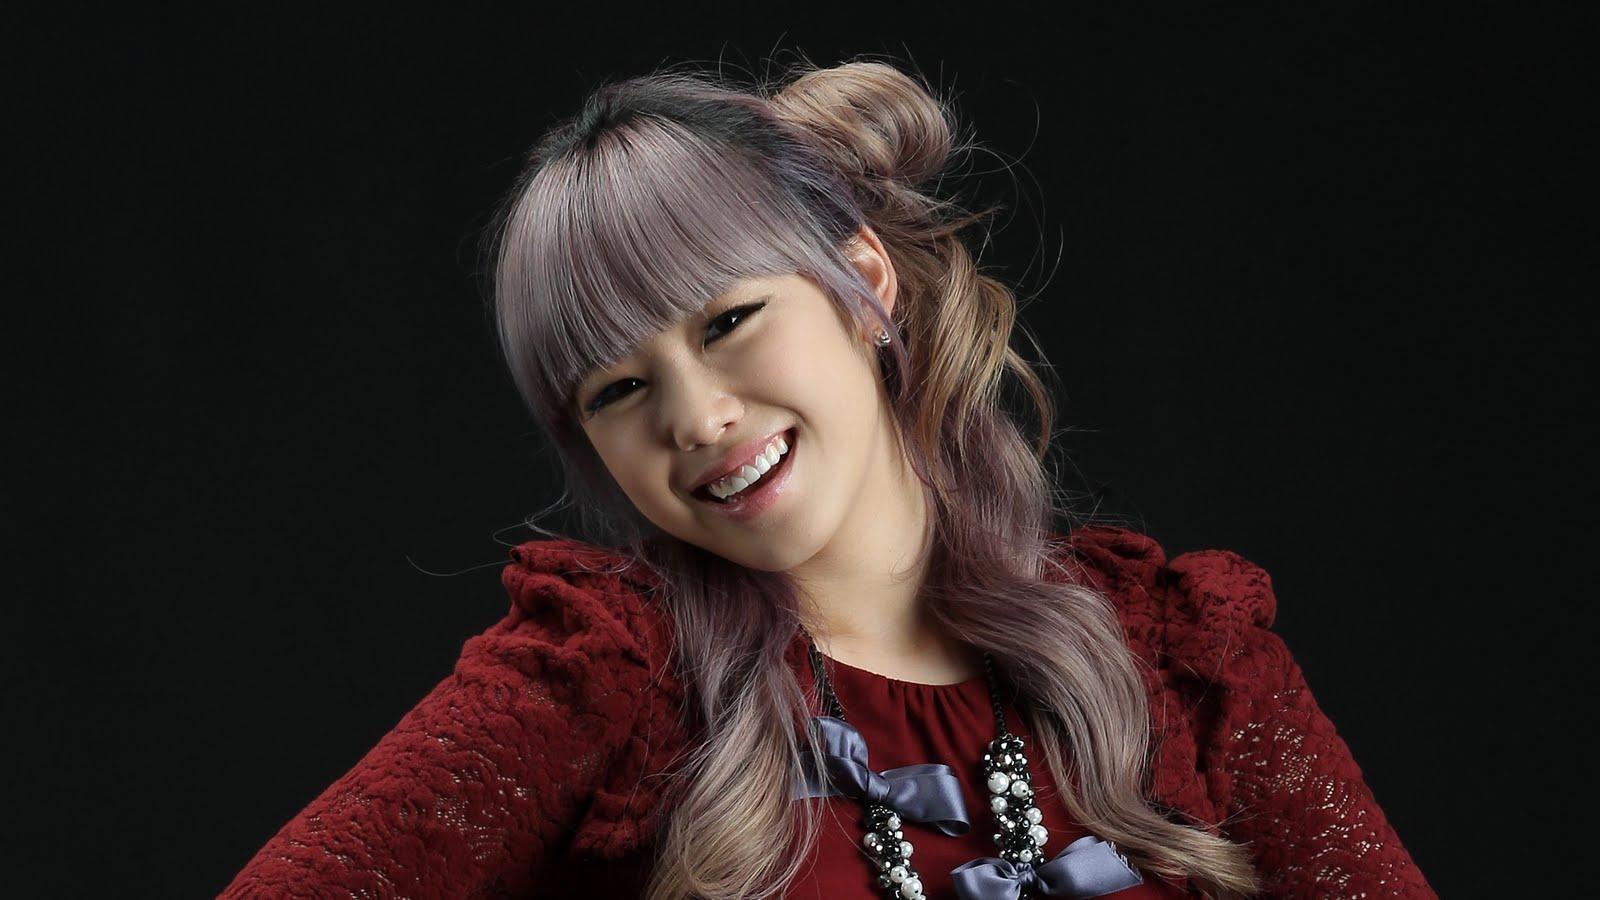 jeon hyosung